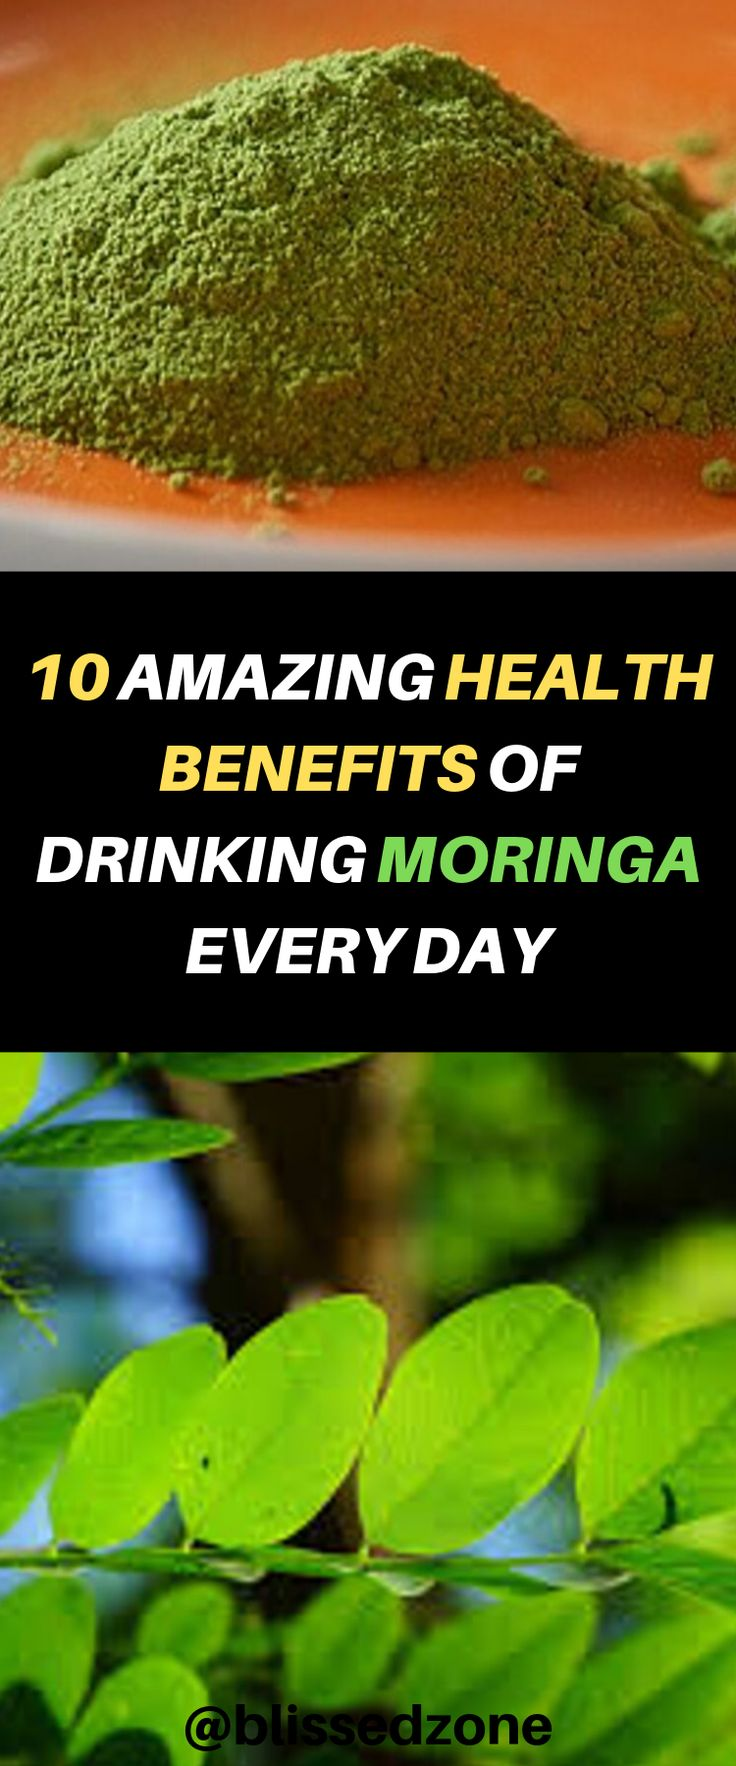 What is moringa,moringa benefits for men,moringa benefits